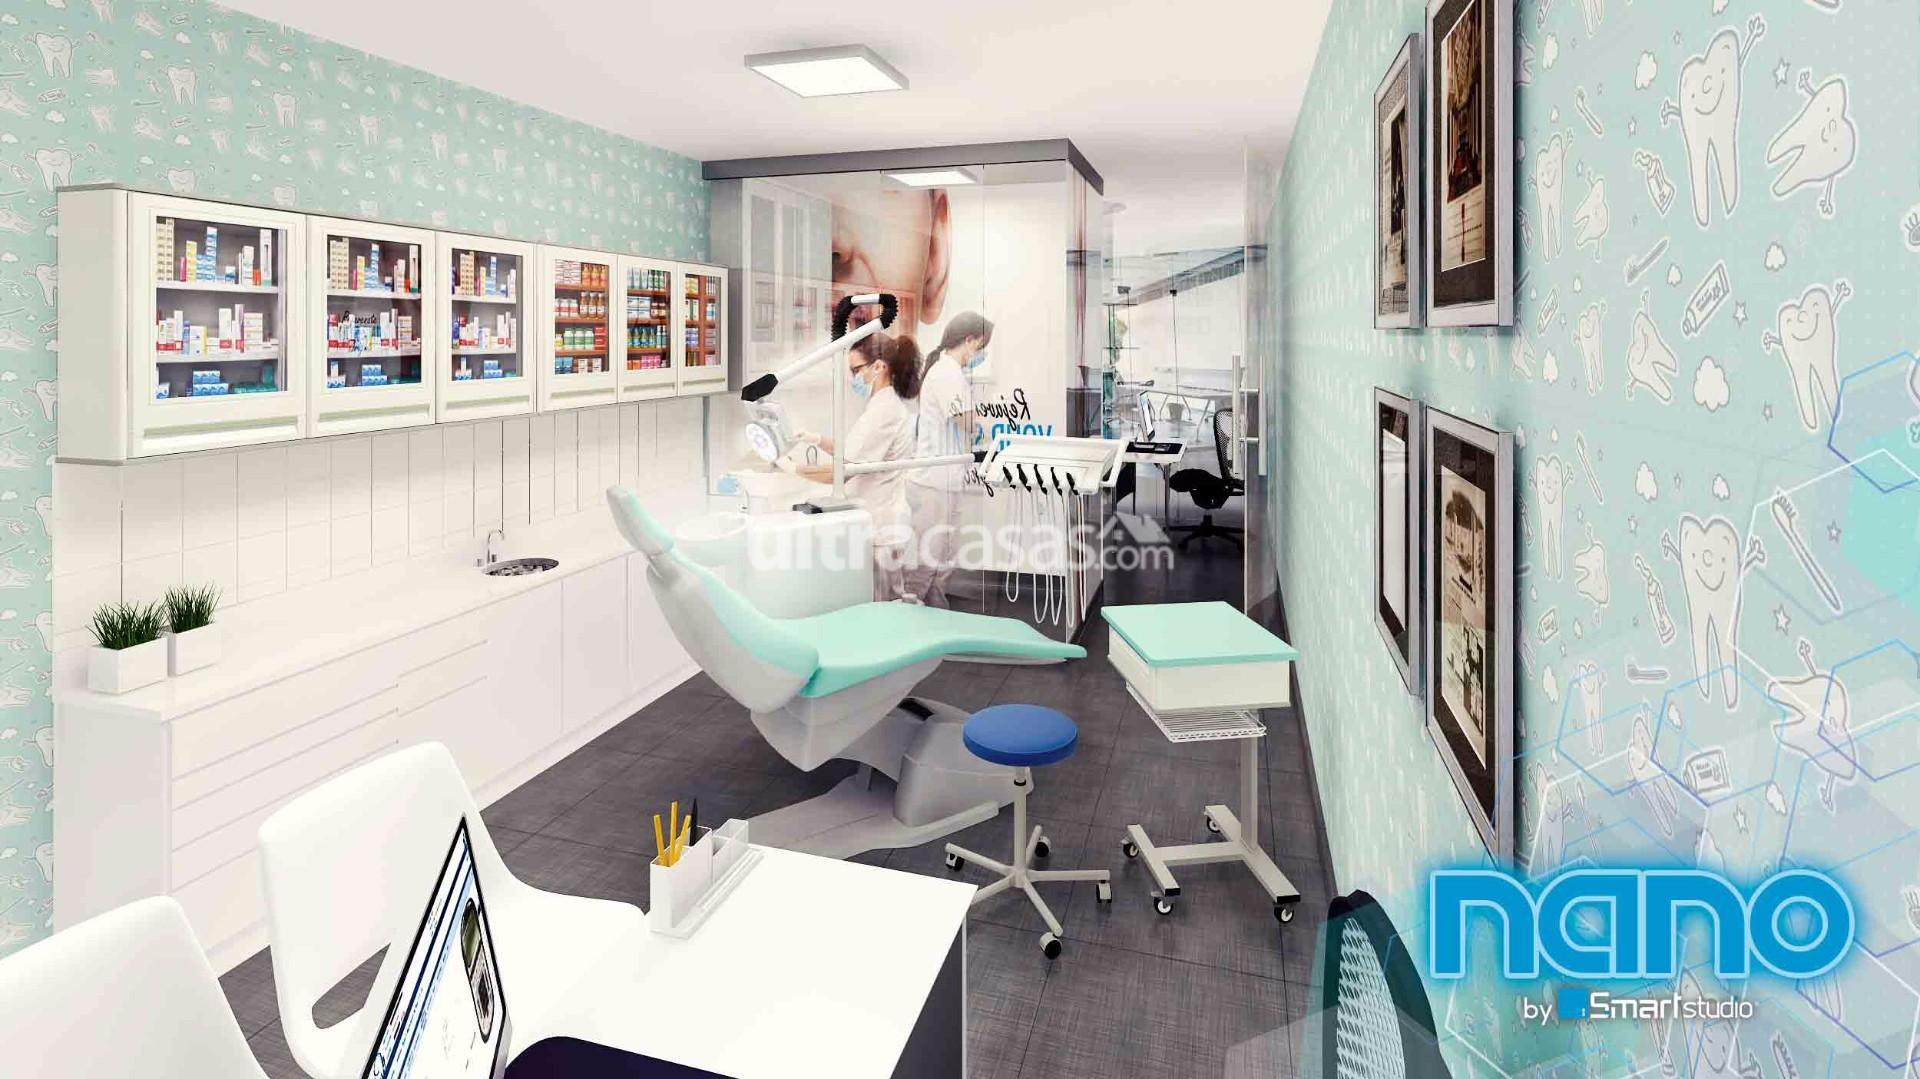 Oficina en Venta SMART OFFICE - 35m2 - Equipetrol e Isuto Laplata 8 Este Foto 5